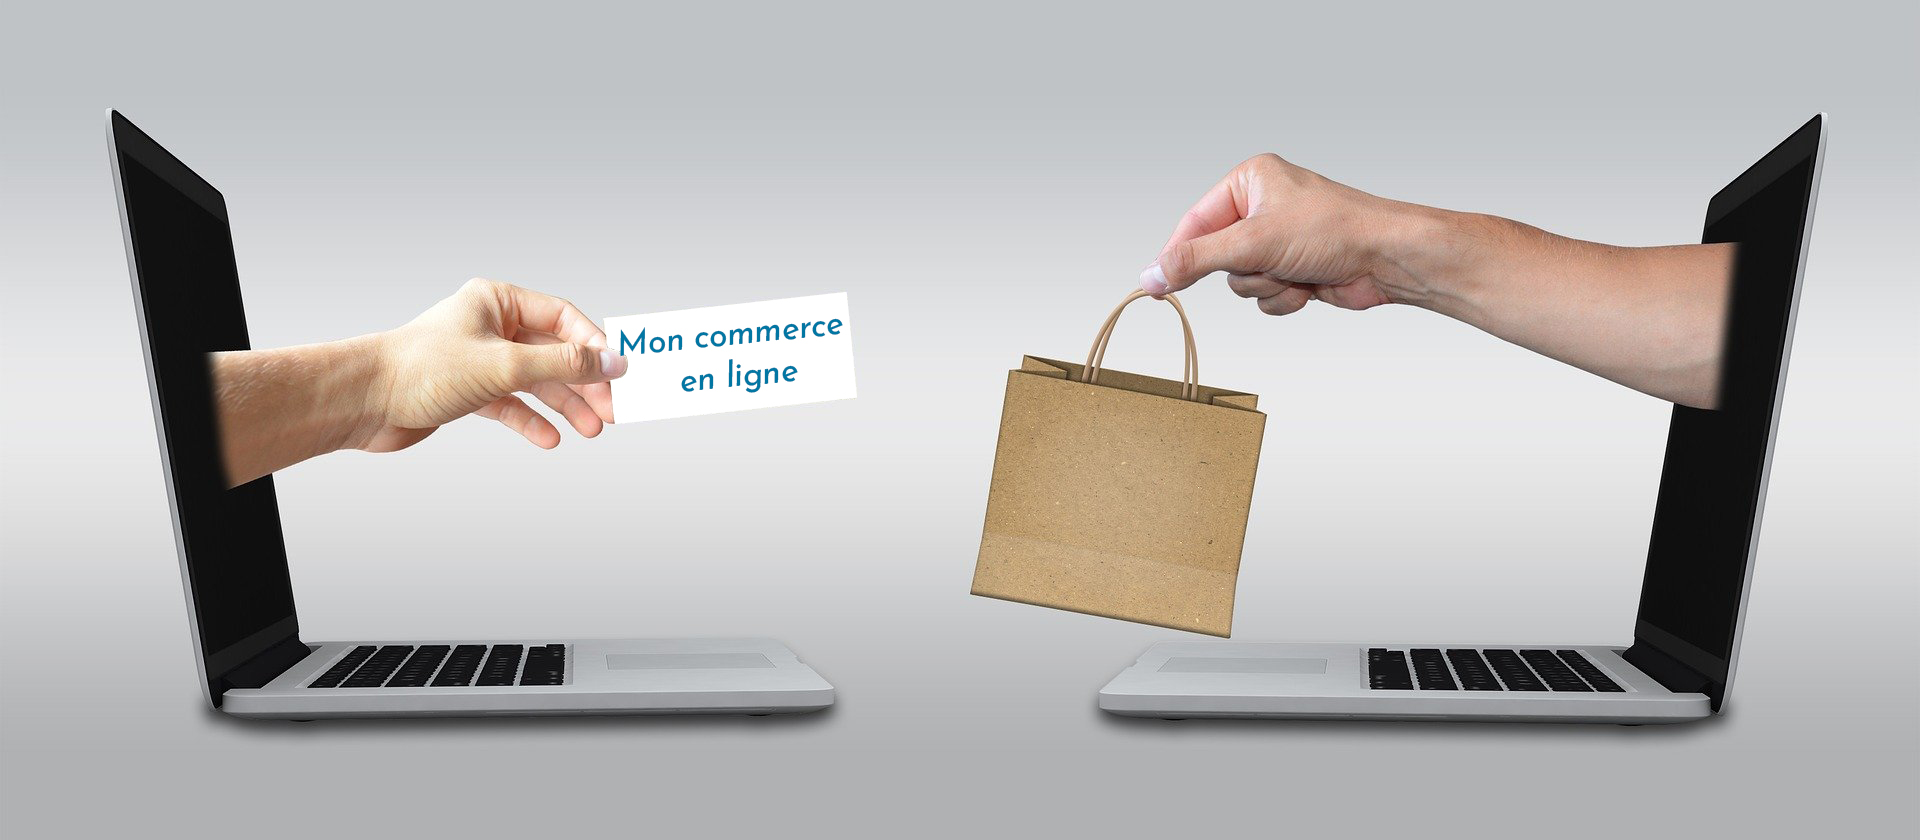 Mon commerce en ligne